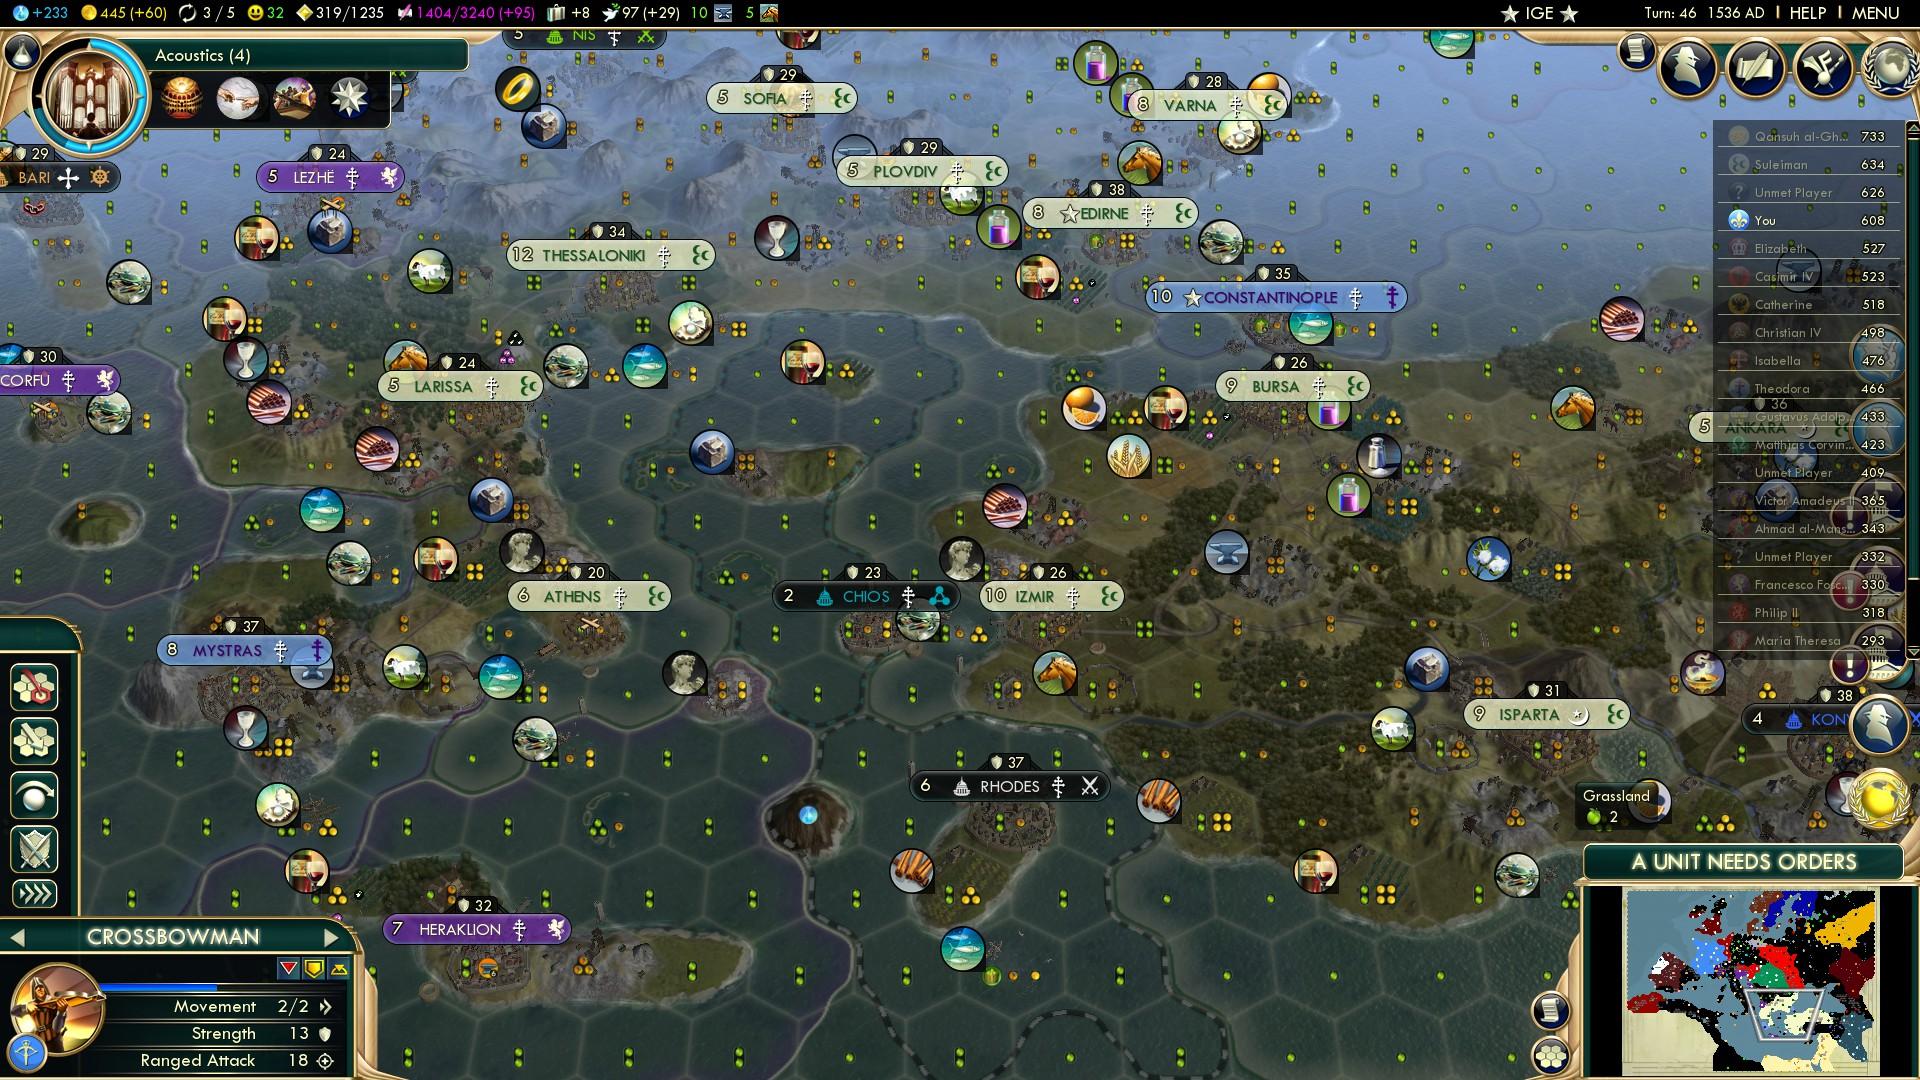 [BNW] Dorian's Europe 1444